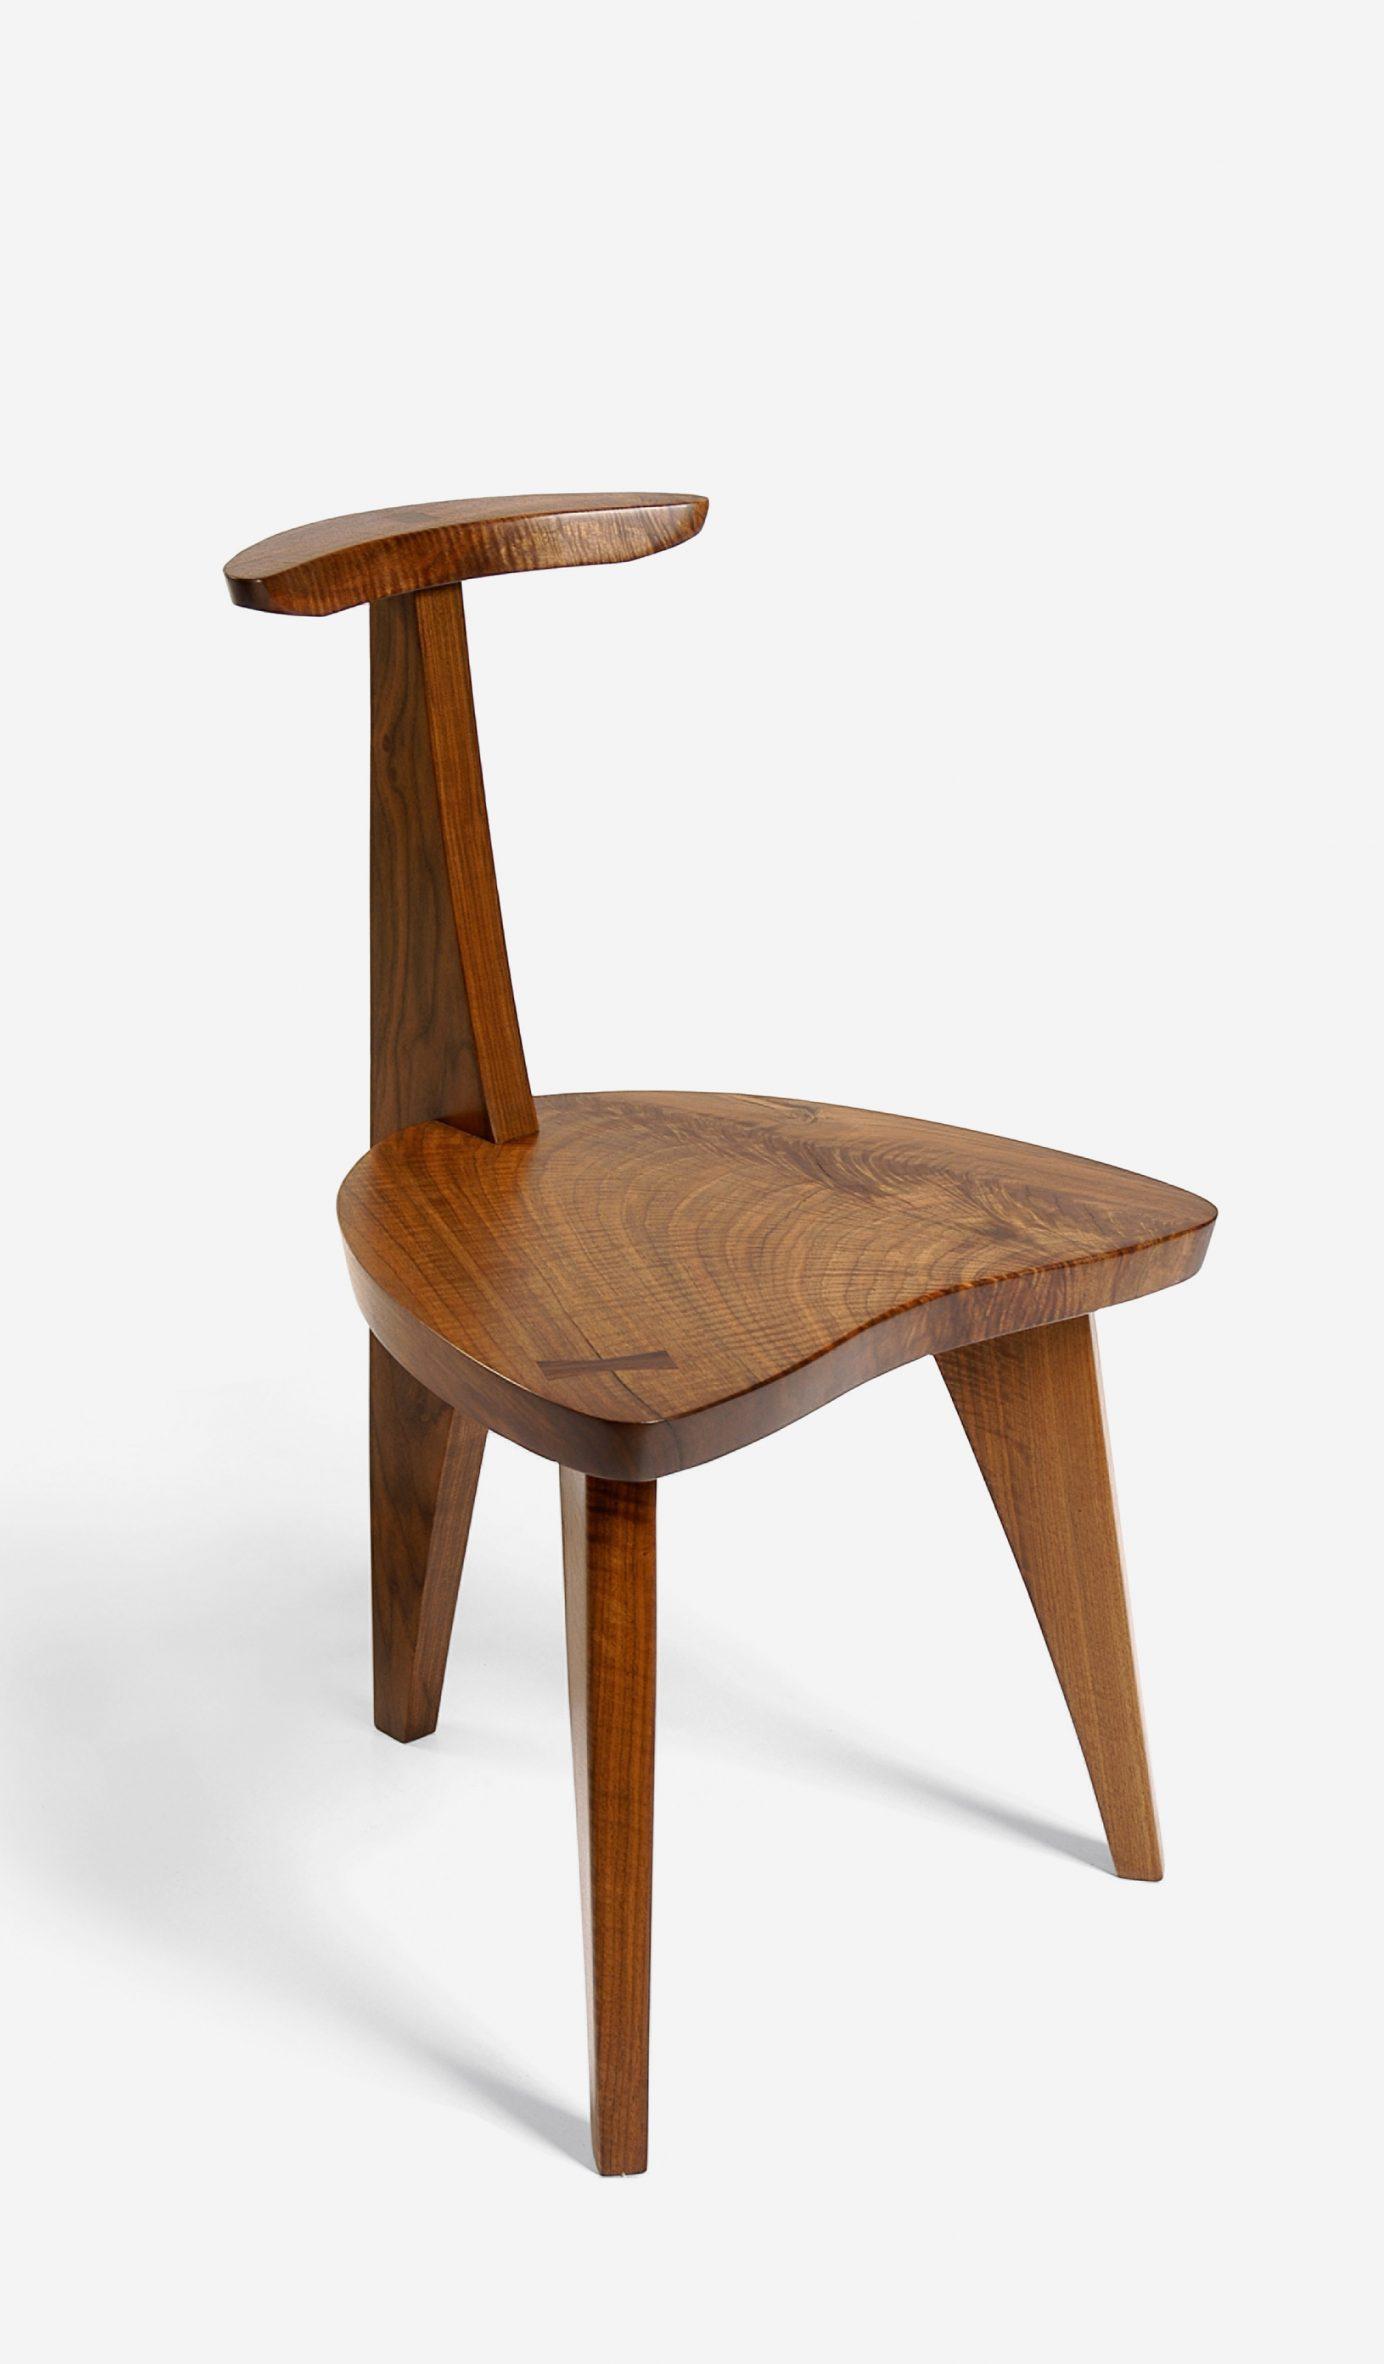 Concordia chair, 2003, by Mira Nakashima